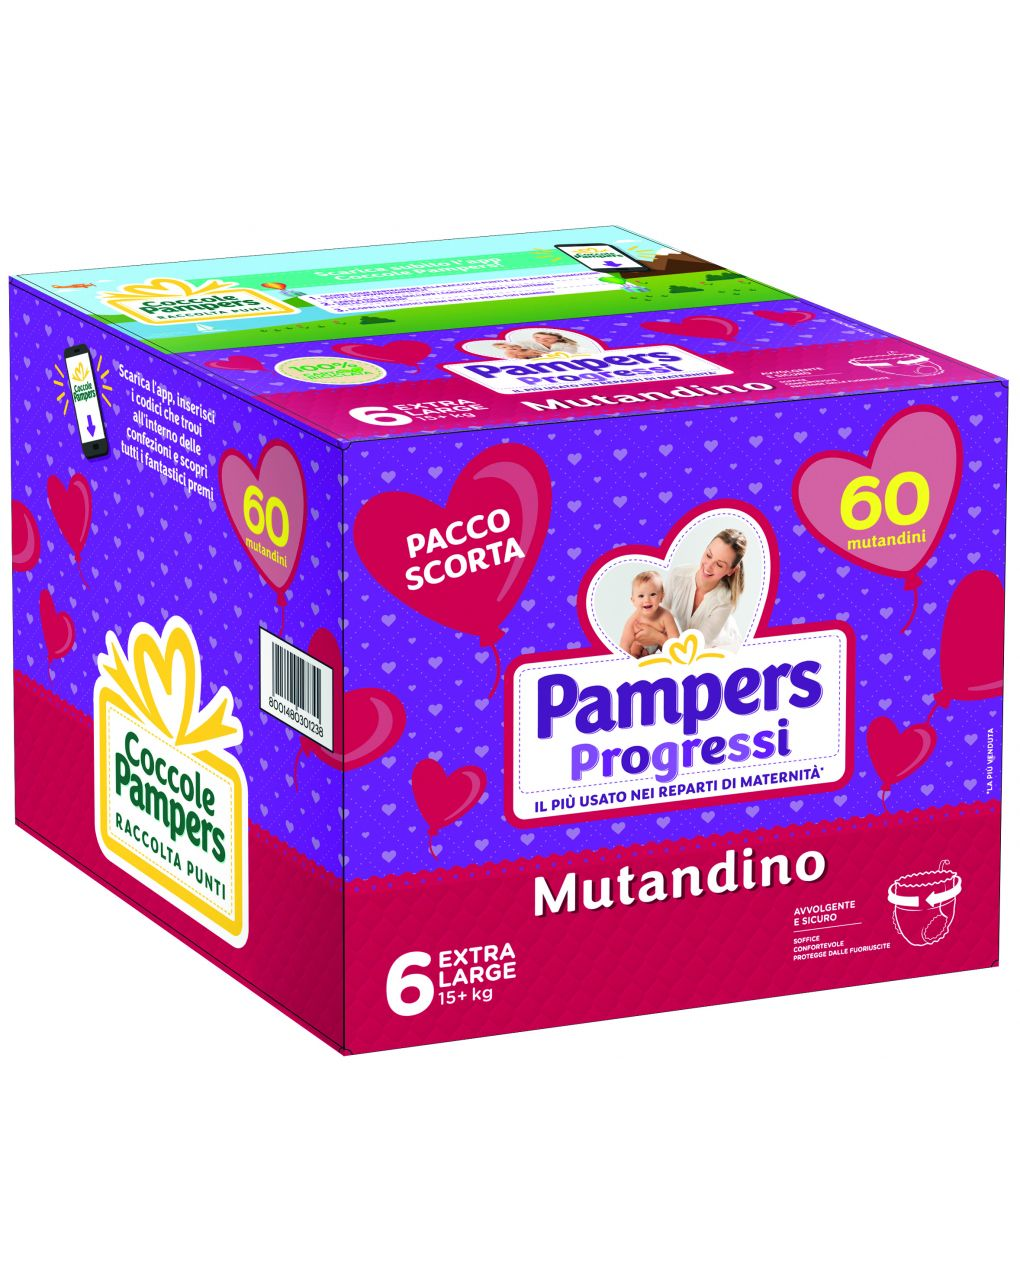 Pannolini mutandino quadri progressi tg. 6 (60 pz) - Pampers